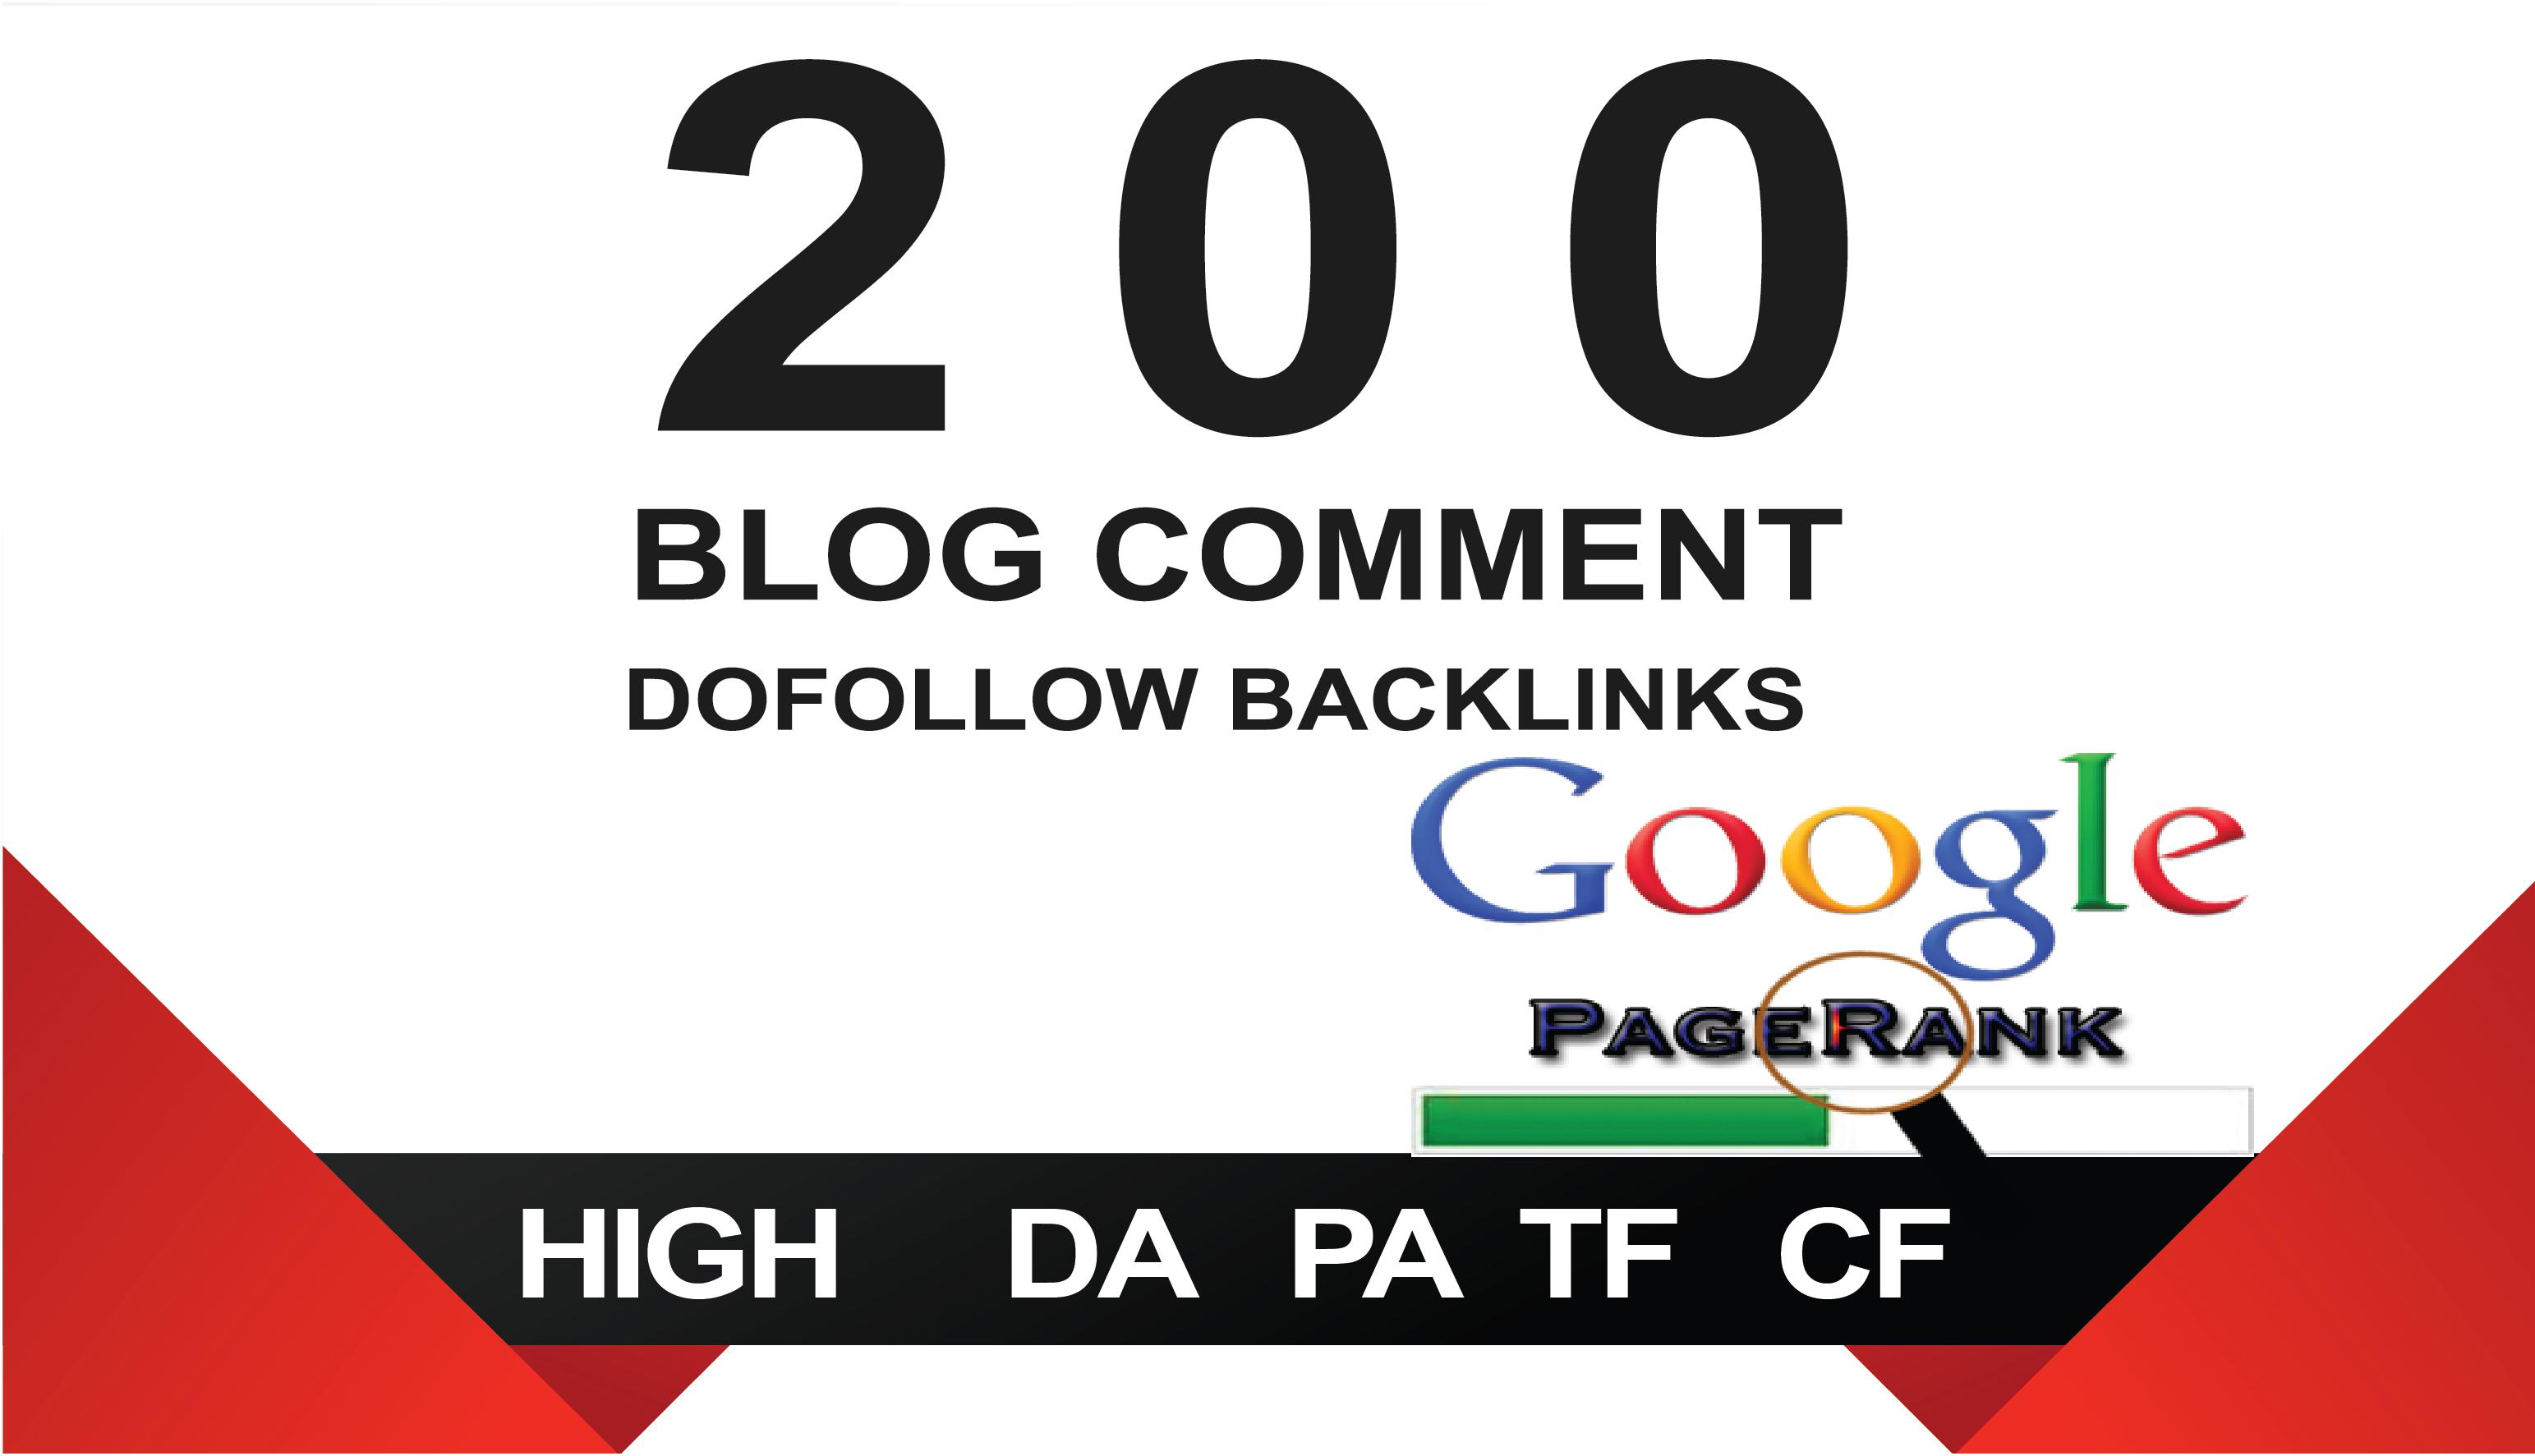 I will provide 200 blog comments backlinks